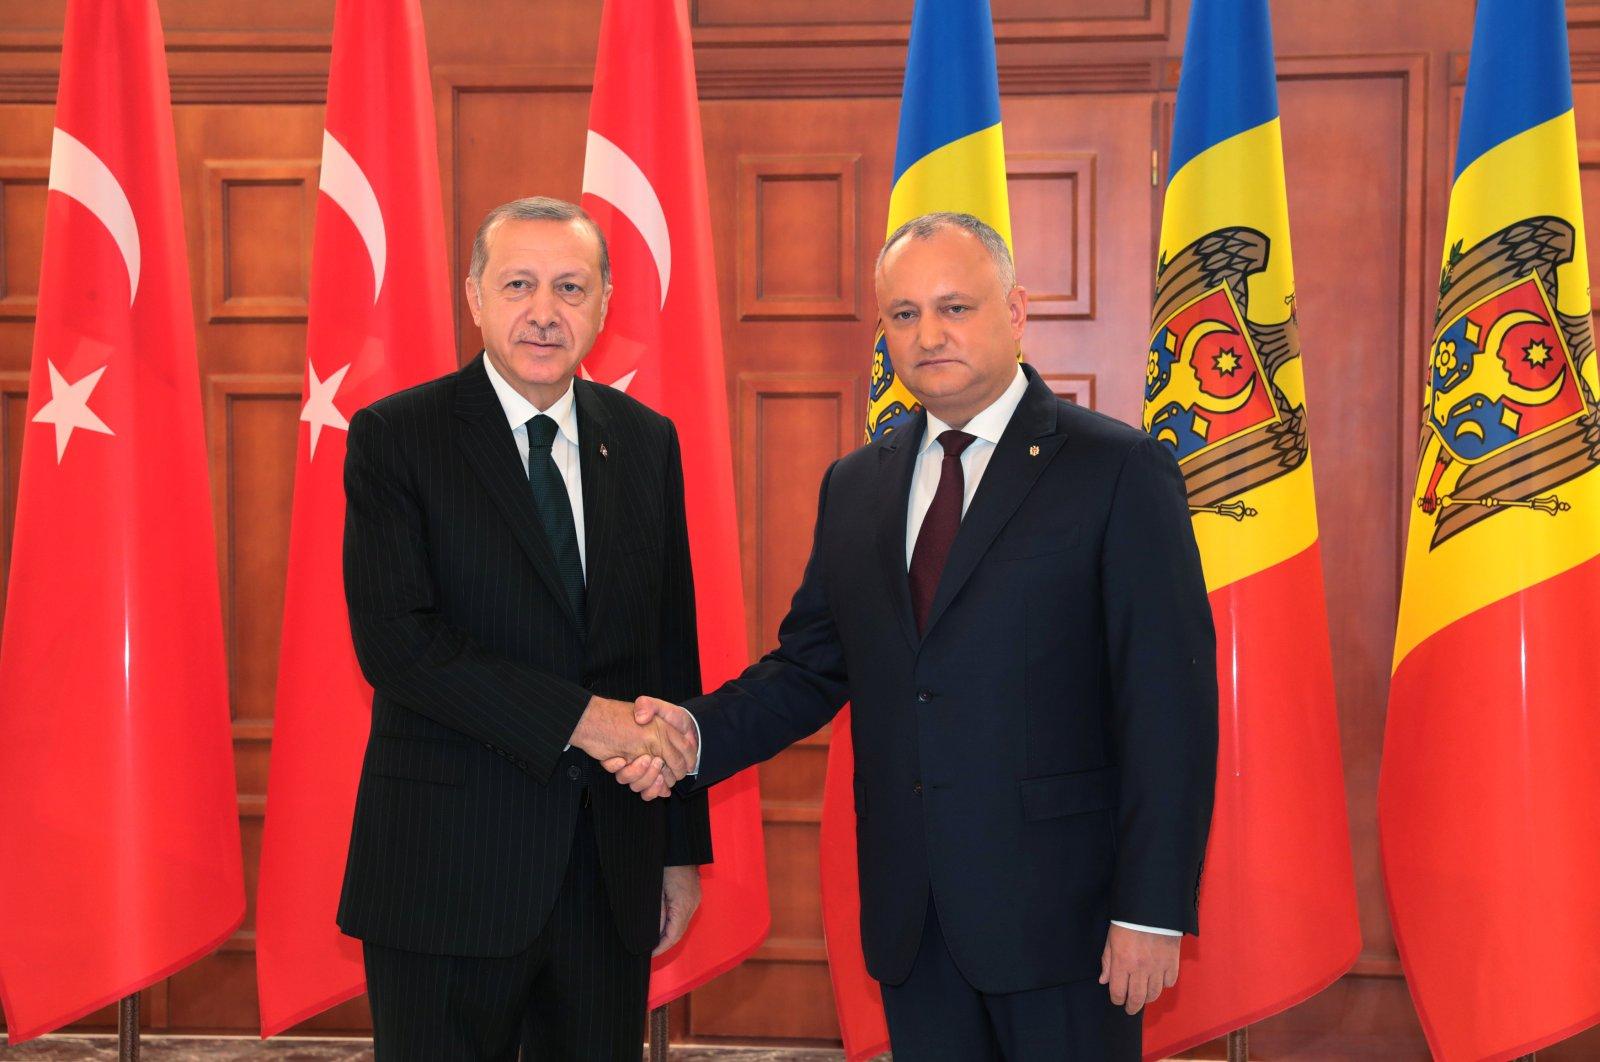 President Recep Tayyip Erdoğan meets with Moldova's President Igor Dodon in Chisinau, Moldova, Oct. 17, 2018. (REUTERS)